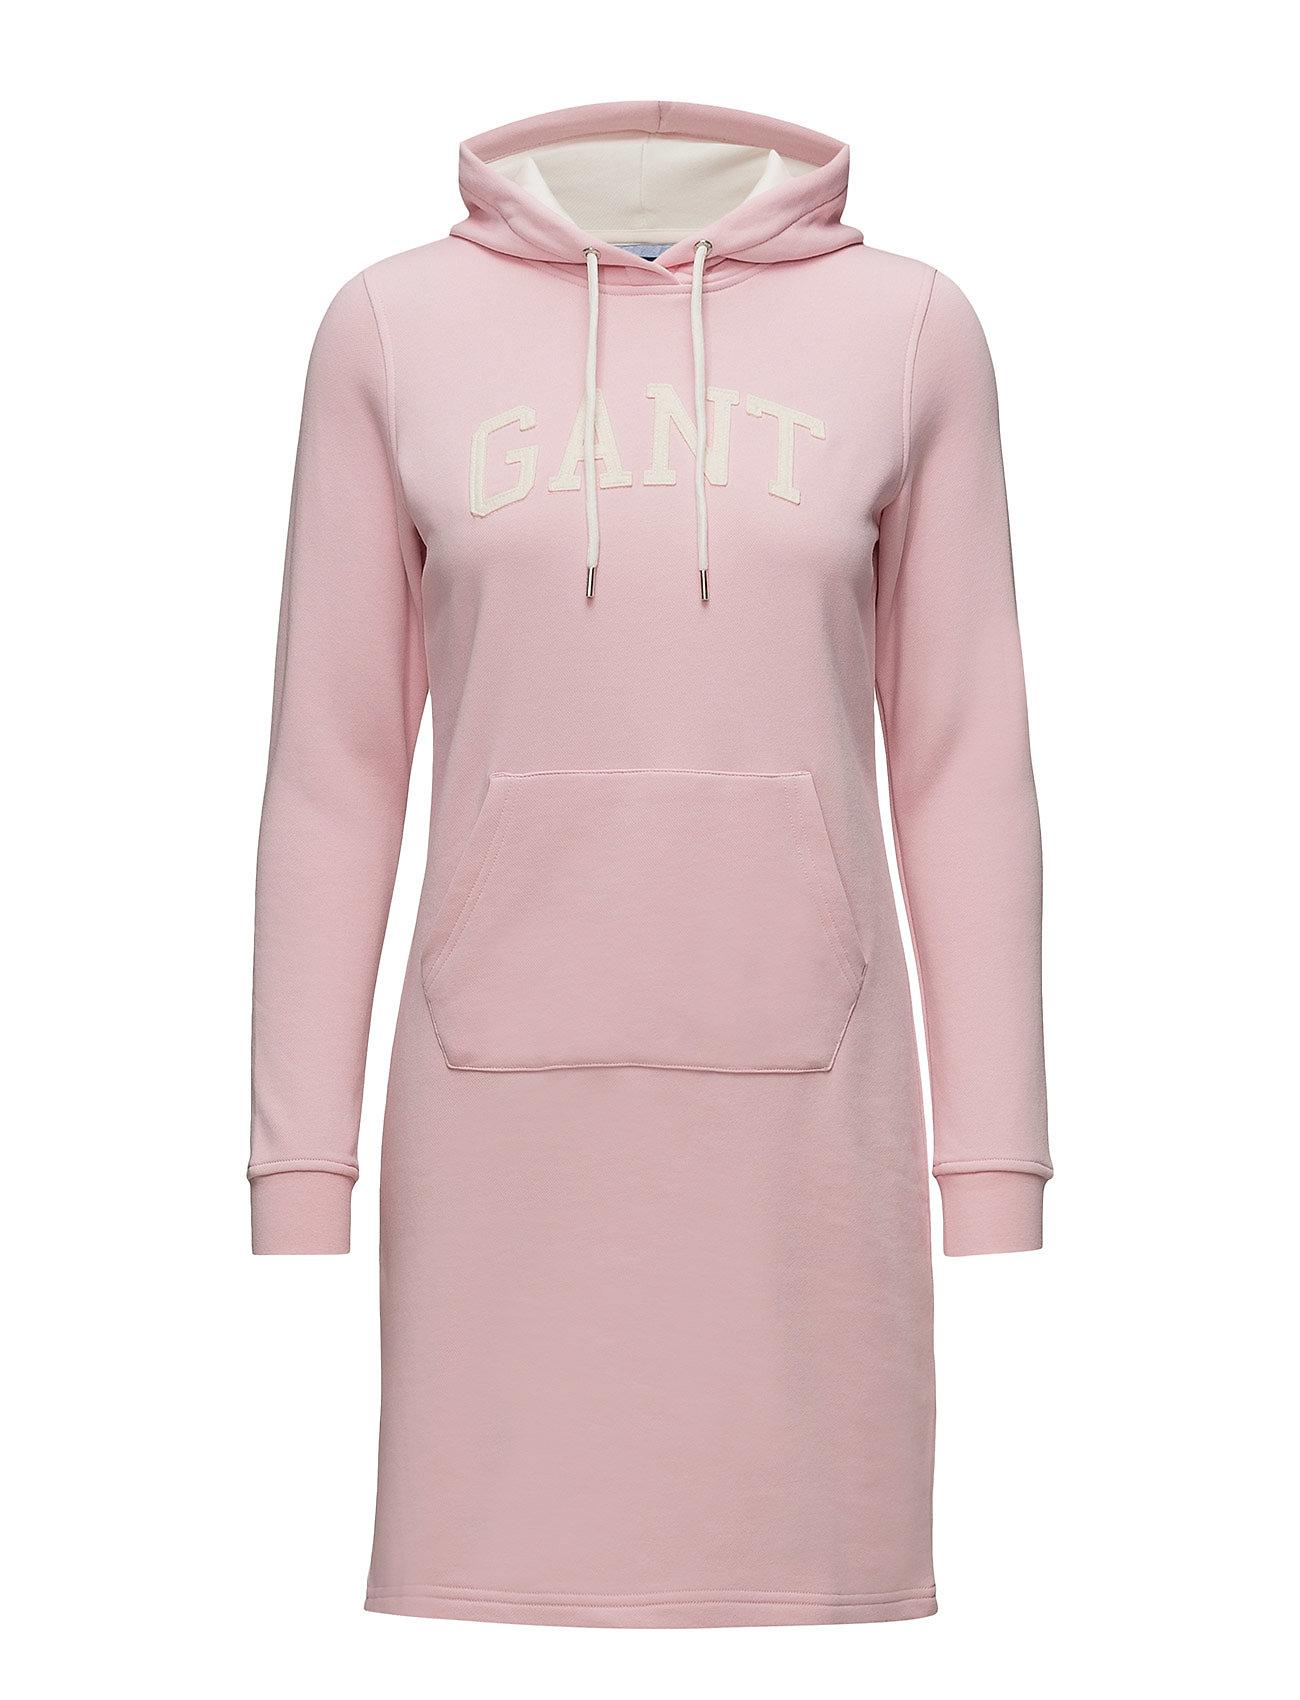 GANT O1. GANT HOODIE DRESS